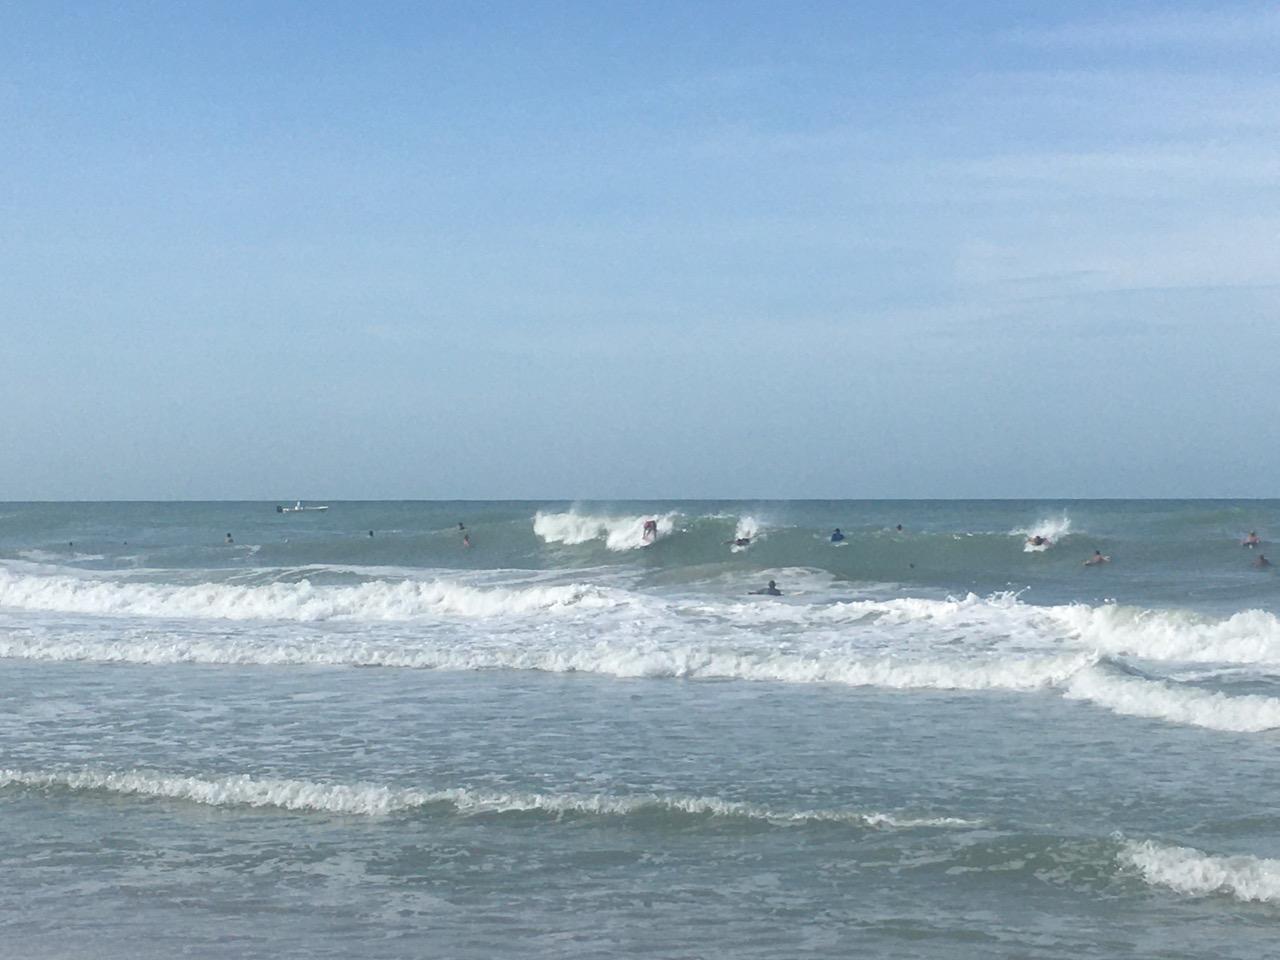 Surf from Hurricane Ida August 29, 2021